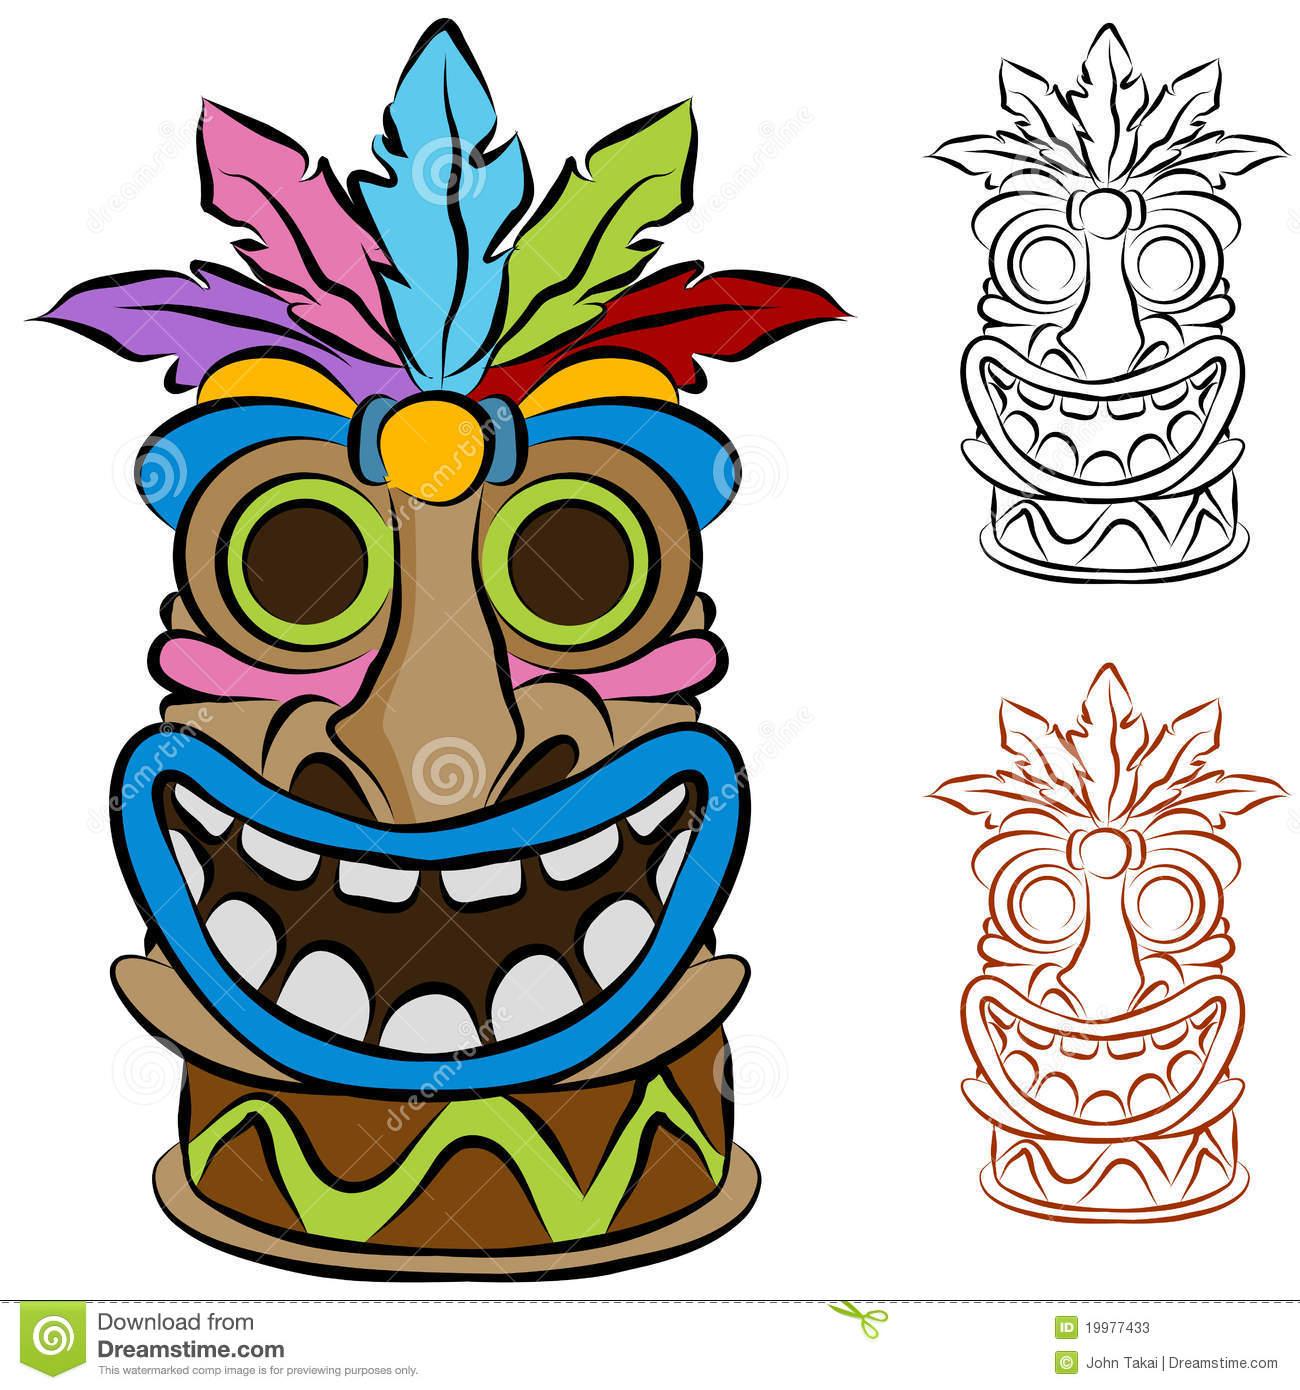 Mask clipart luau LUAU Mask Tiki Happy Mask